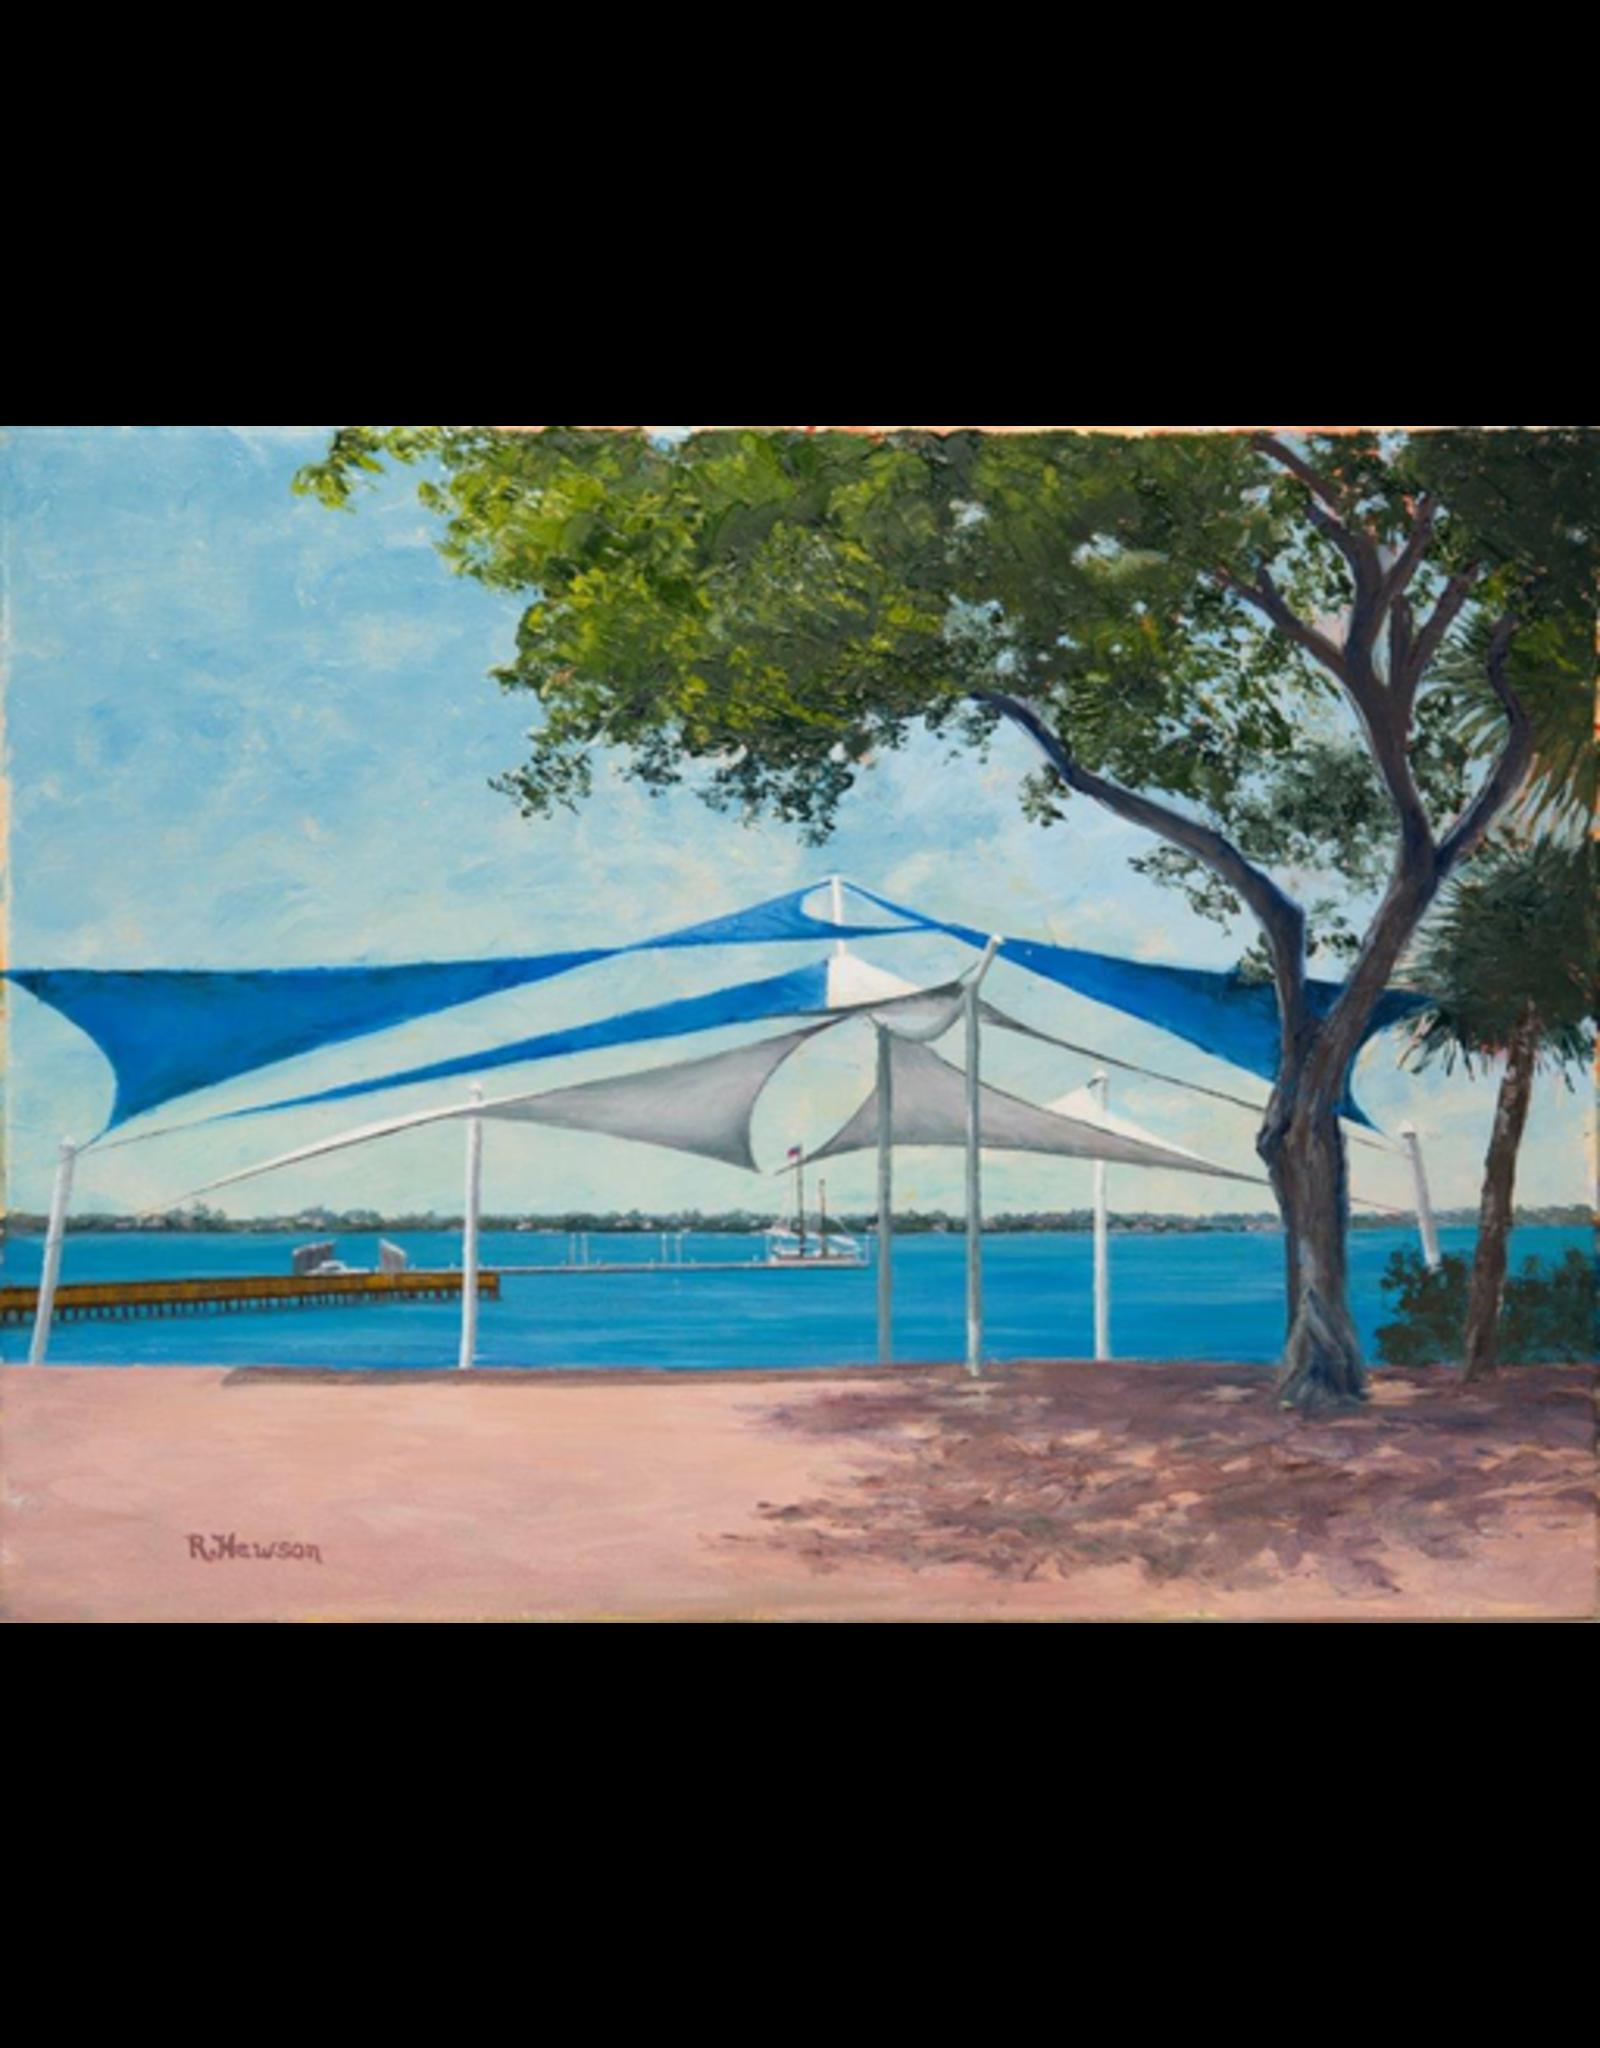 Ruthann Hewson Sails at Riverwalk Stage (Original Oil, Framed, 18x24, RUTH)